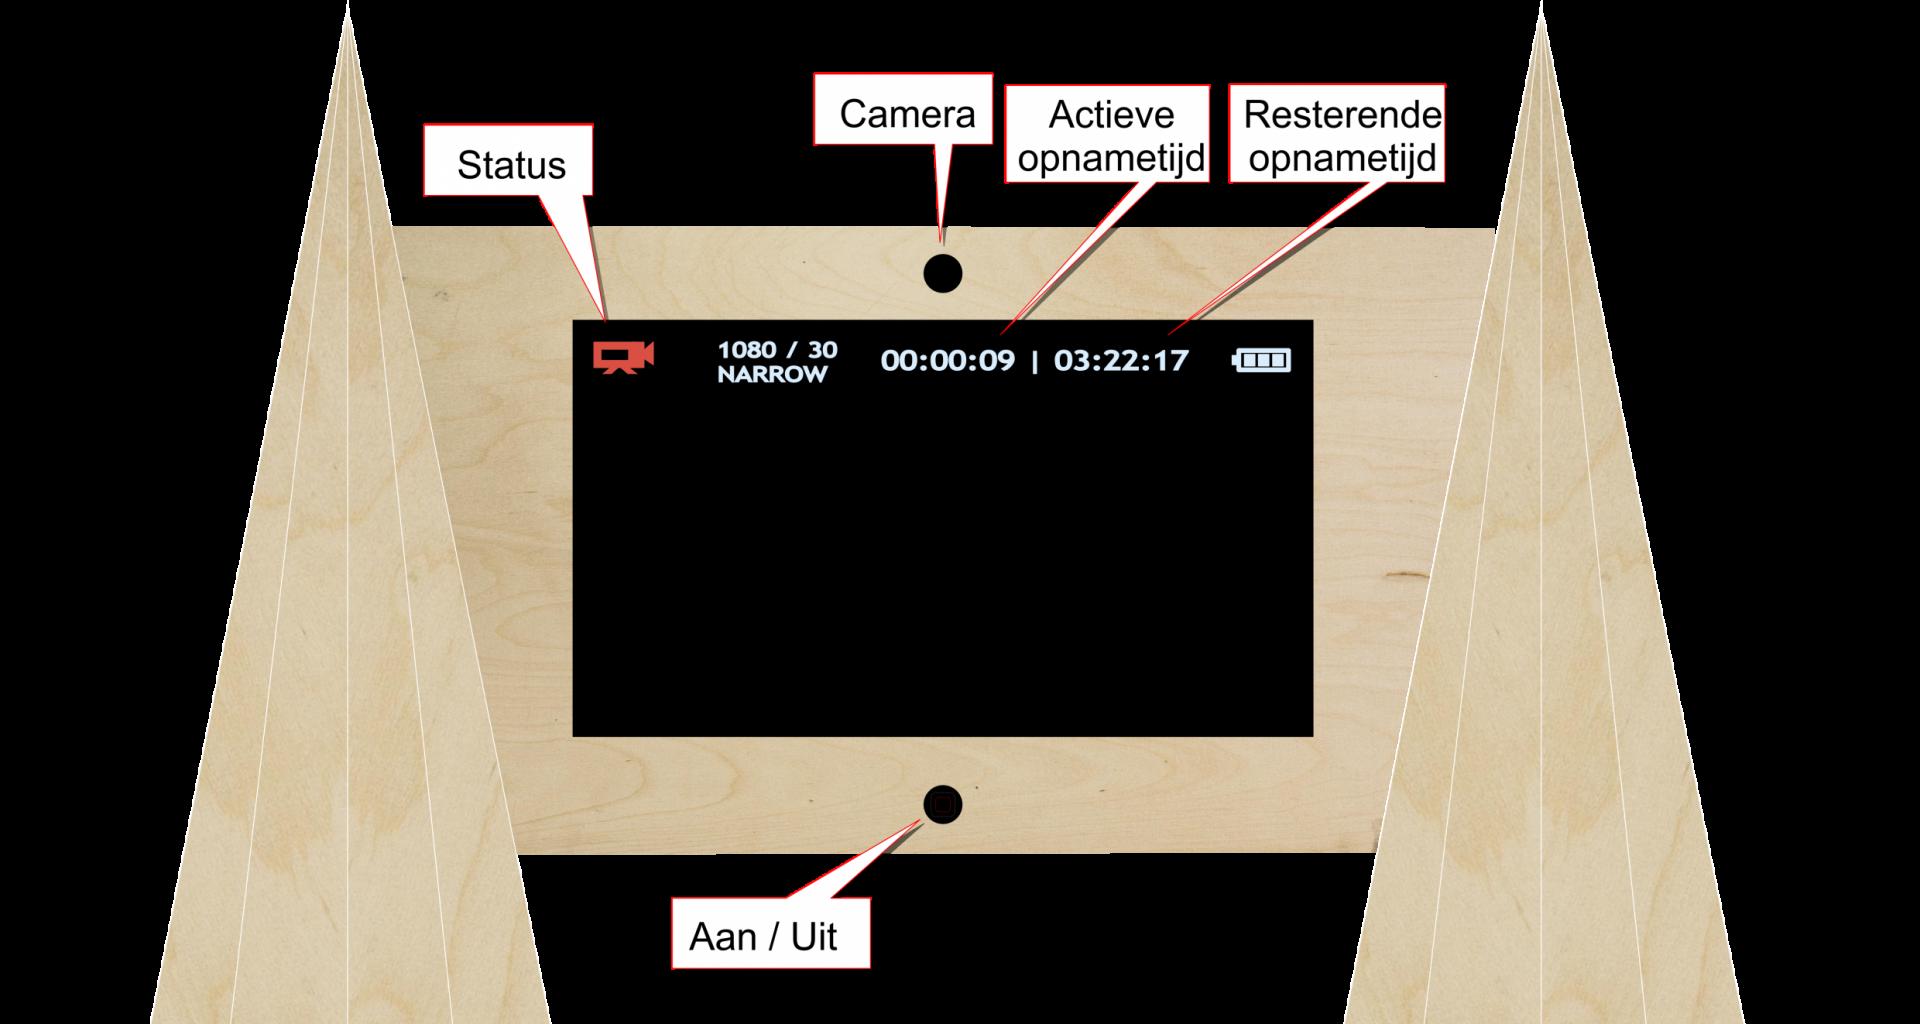 Videobooth Retro X1 - Display info